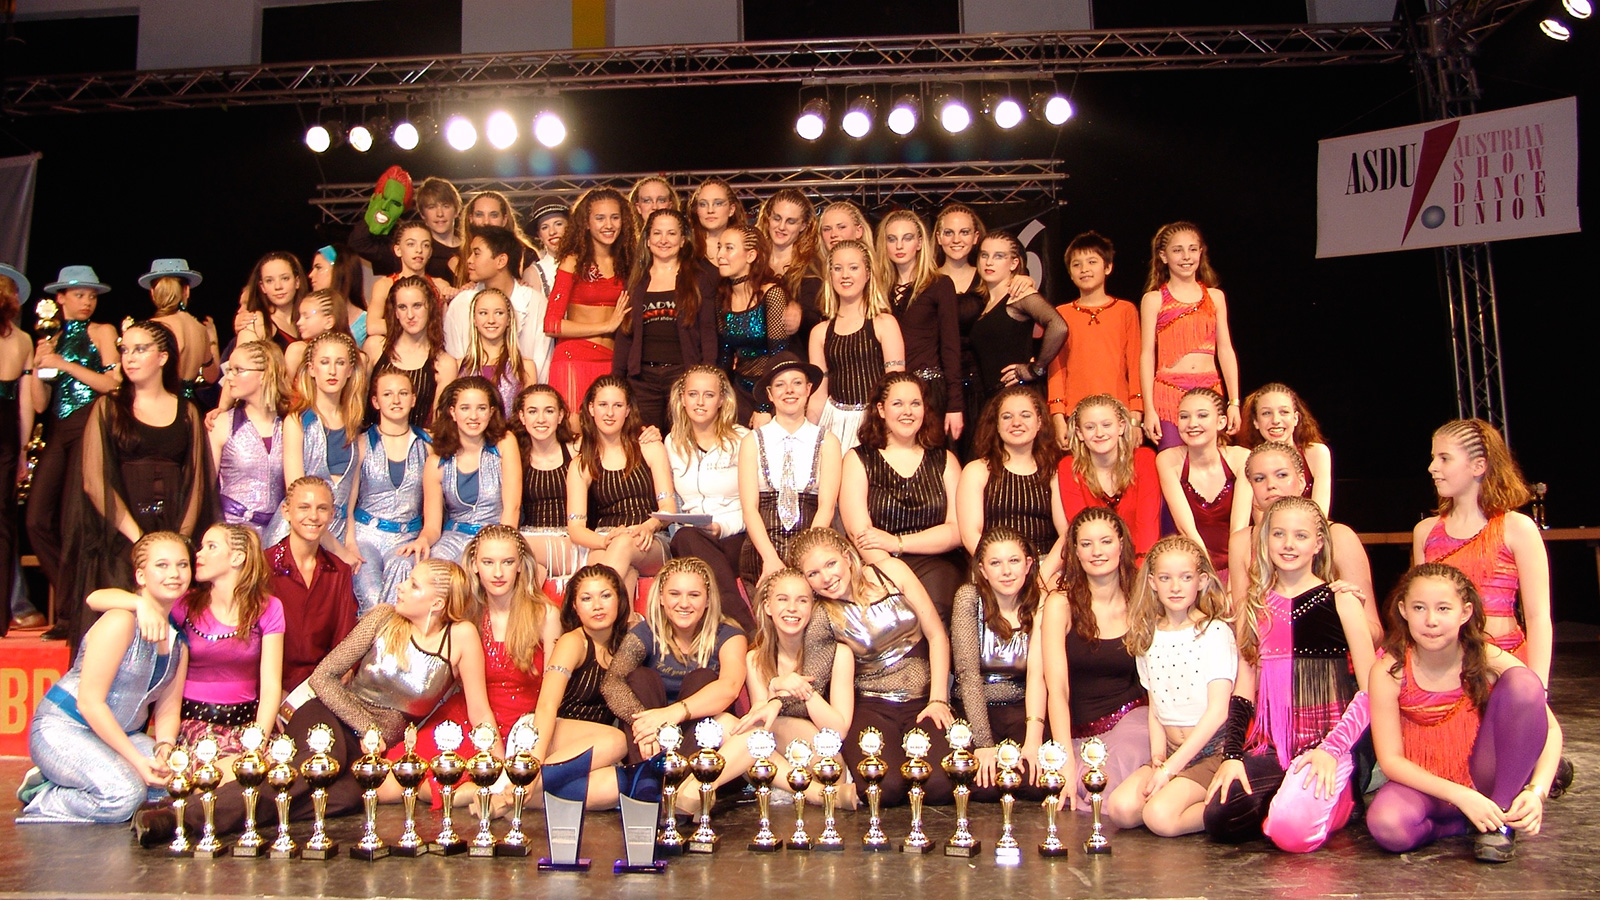 Austrian Open 2006